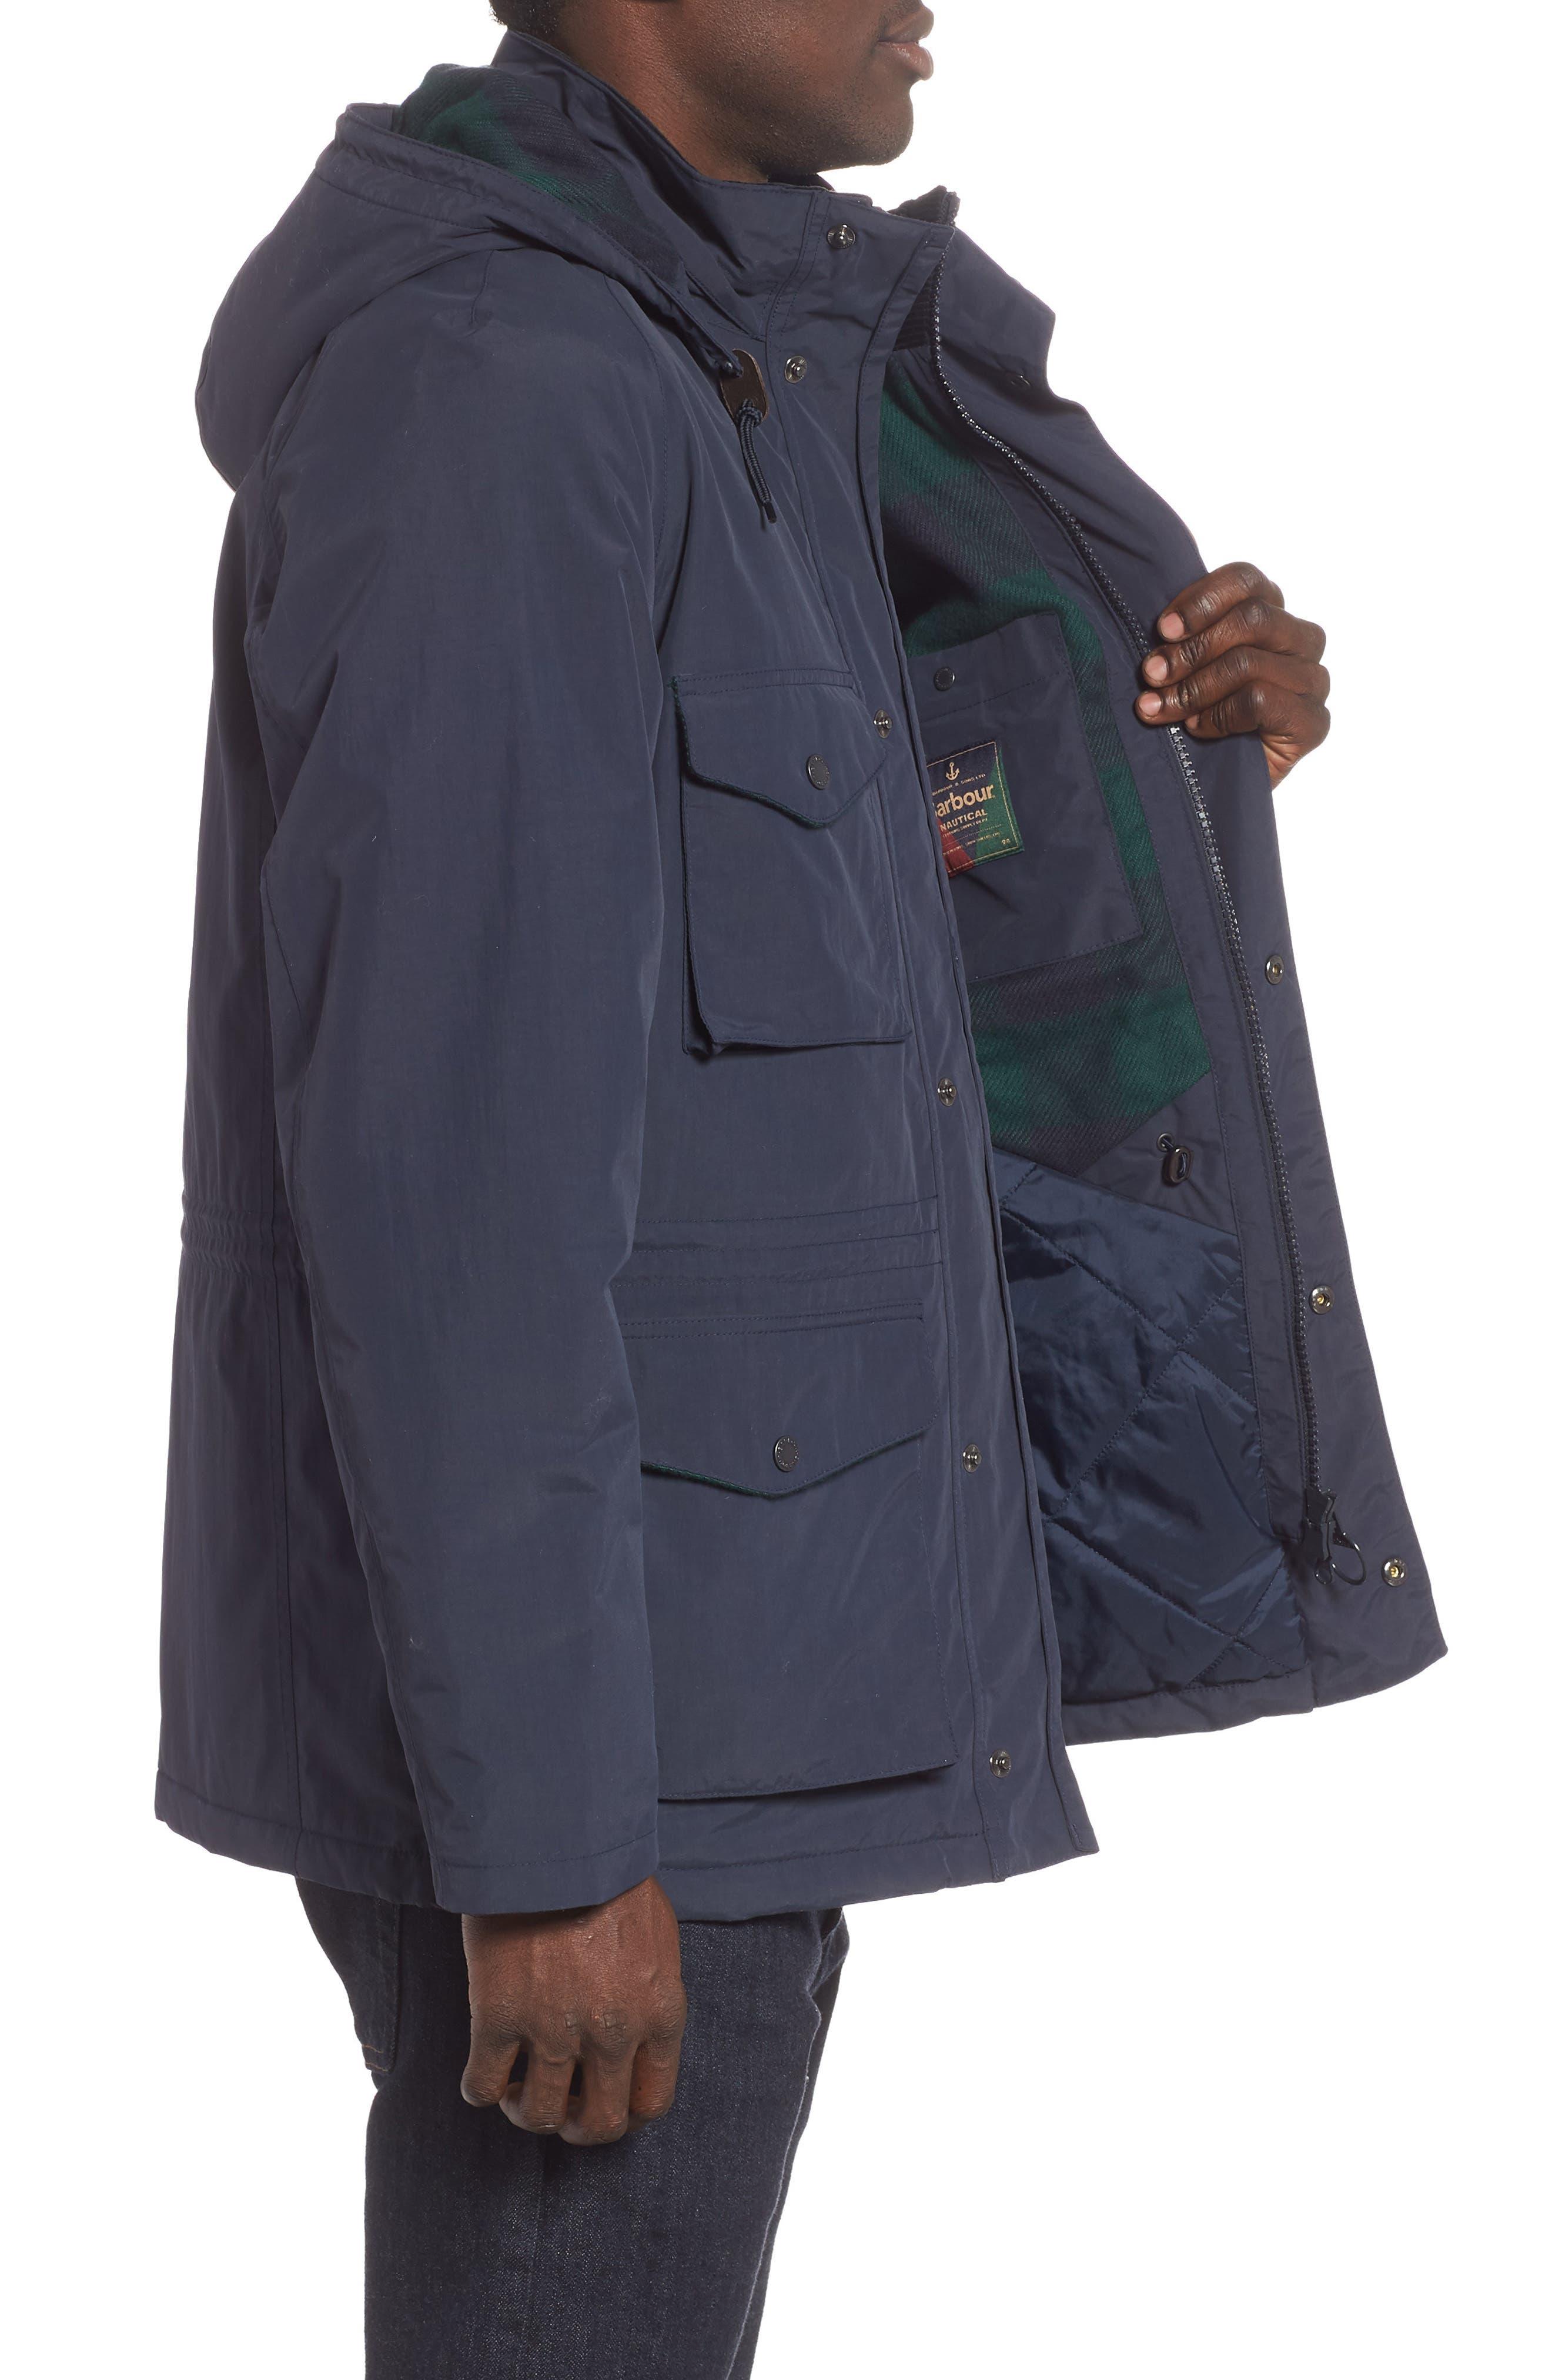 BARBOUR, Tiree Waterproof Jacket, Alternate thumbnail 3, color, 410